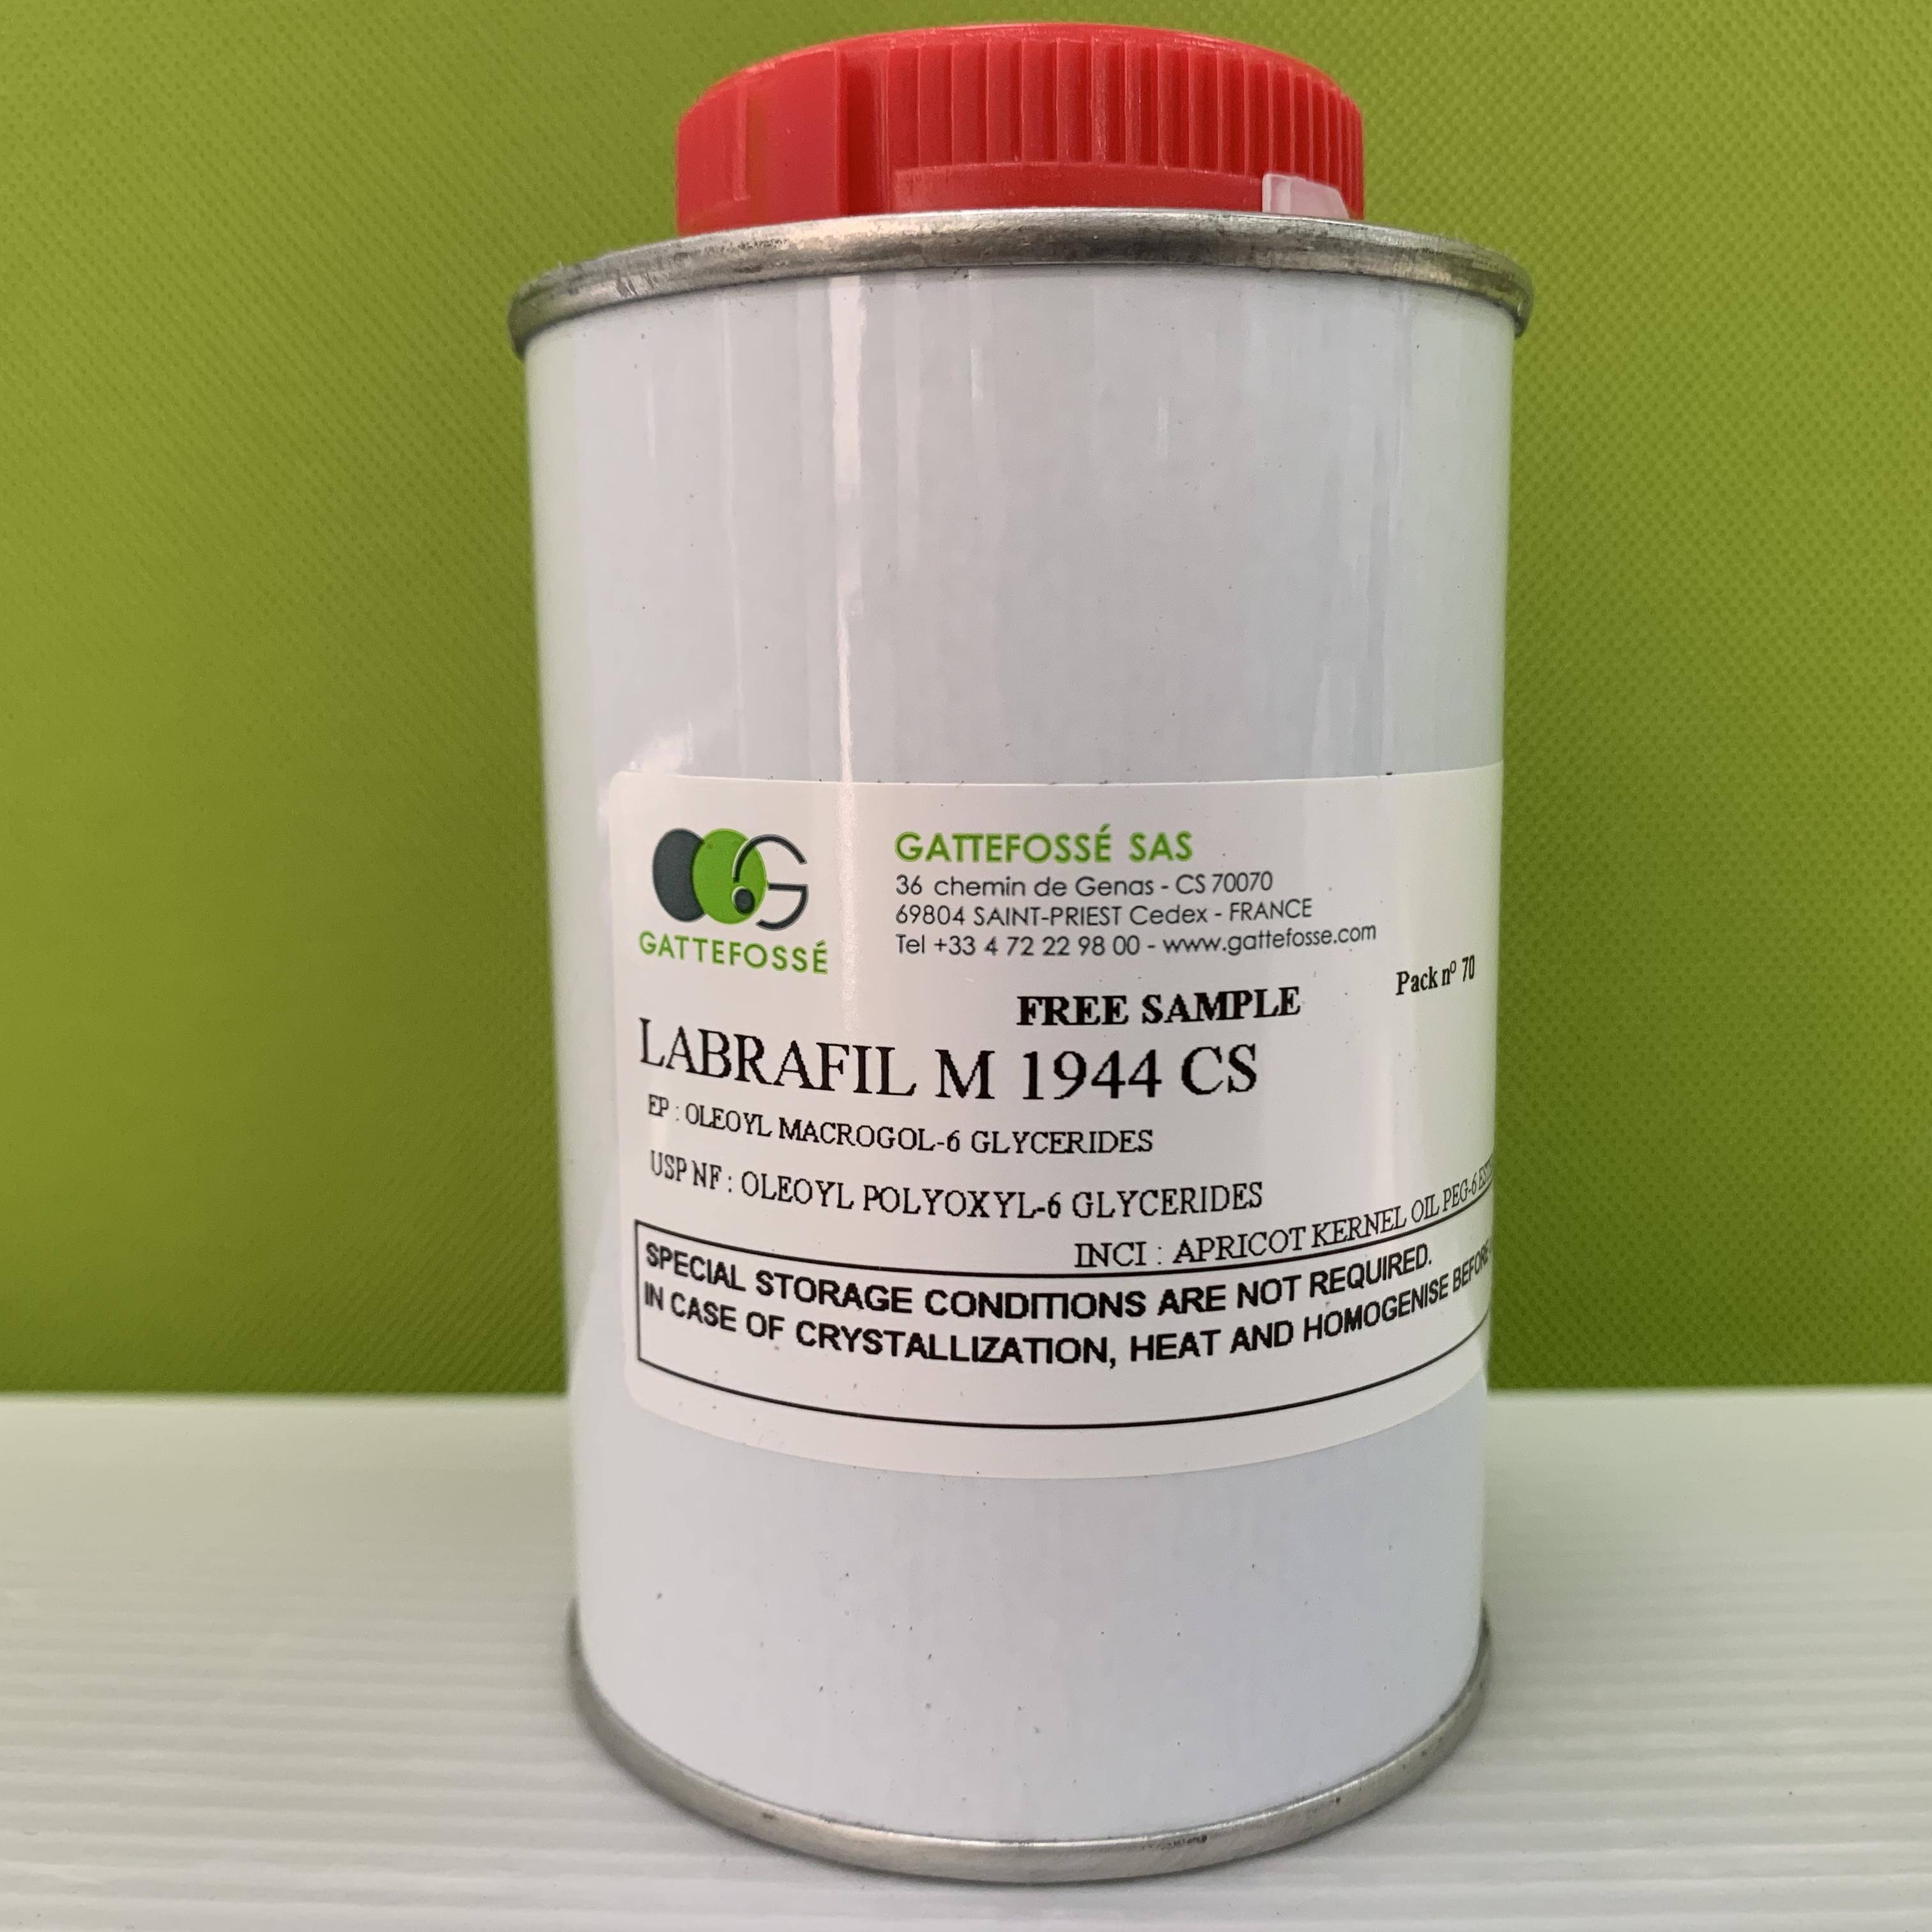 LABRAFIL® M 1944 CS 油酸聚乙二醇甘油酯